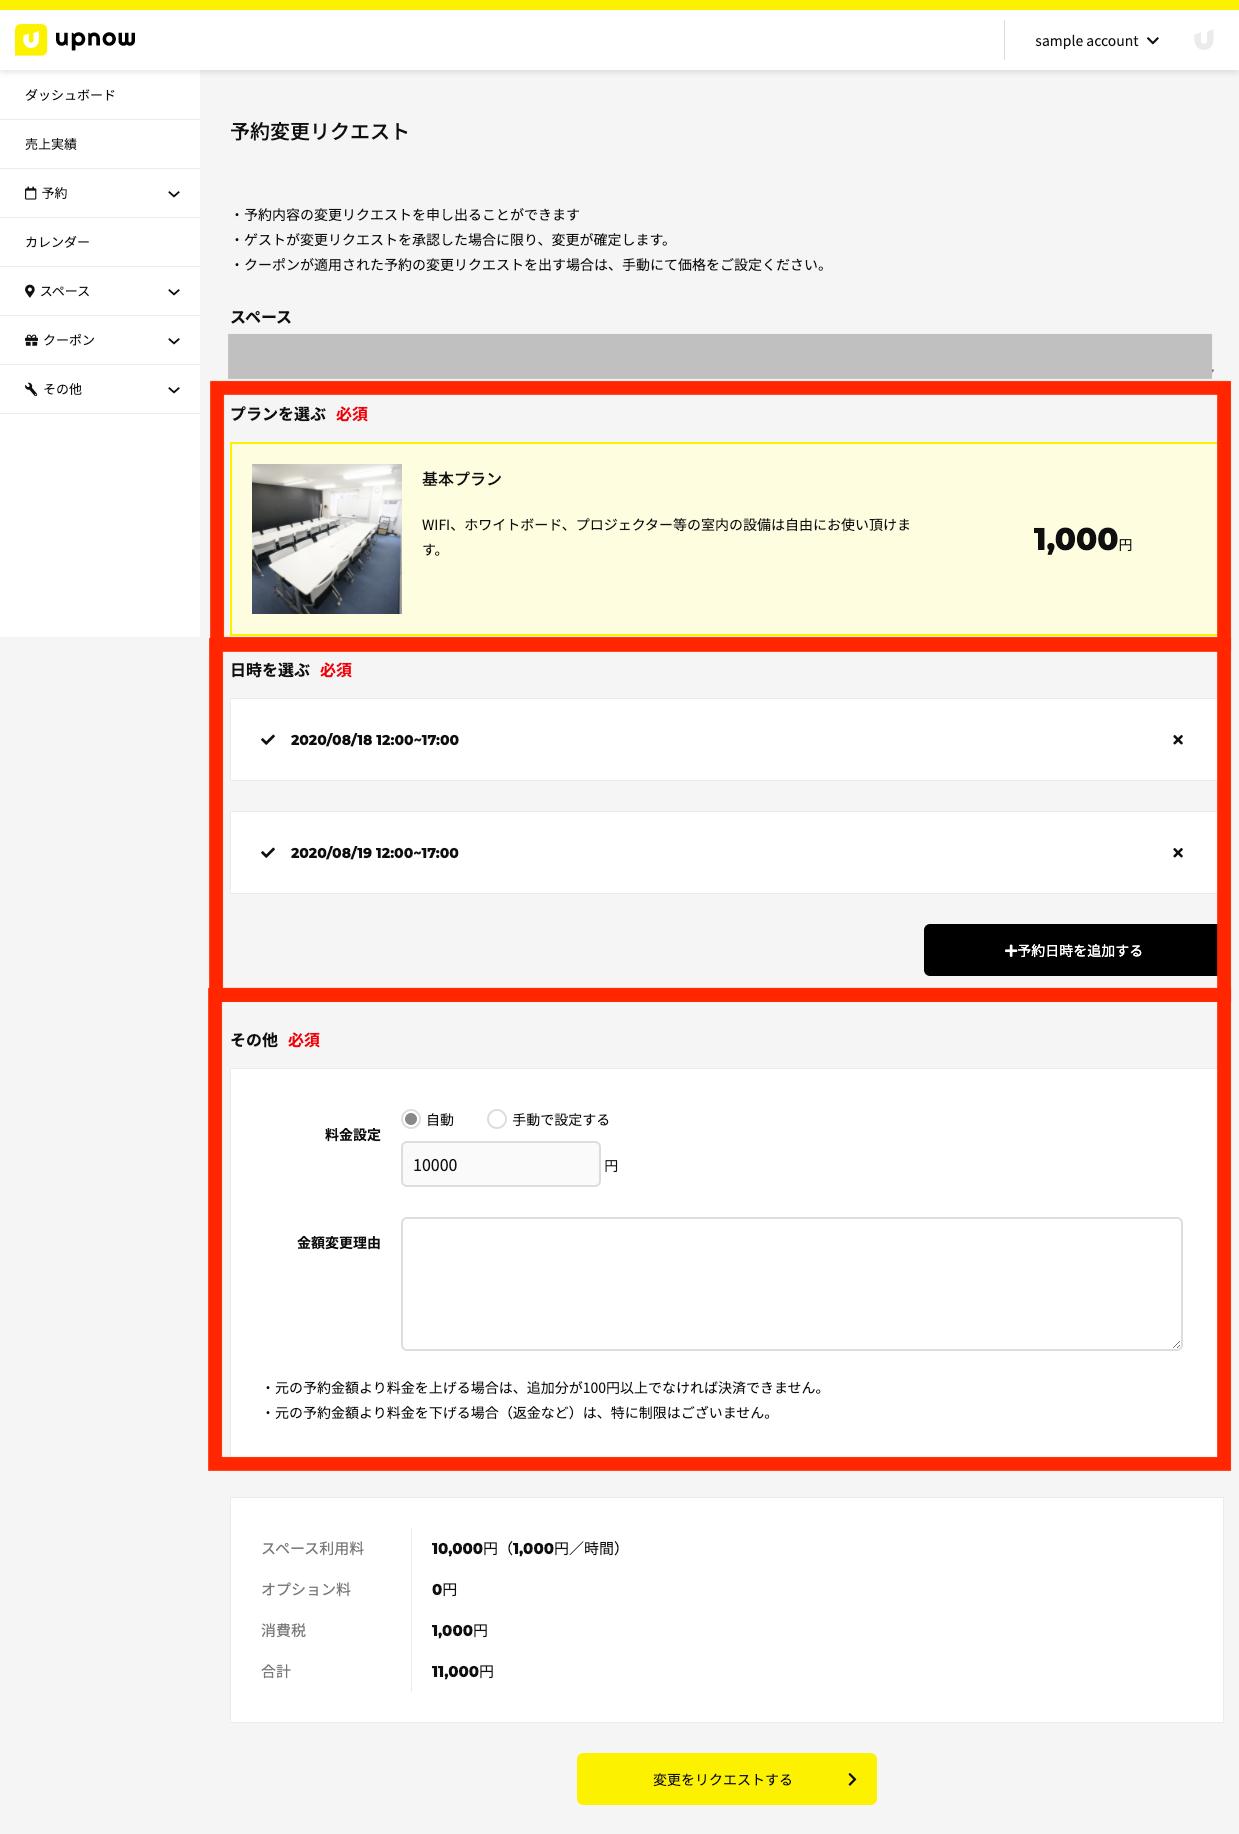 FireShot Capture 119 - 予約変更リクエスト - upnow - スペース予約サイトを簡単に作れるアップナウ - test.upnow.jp.png